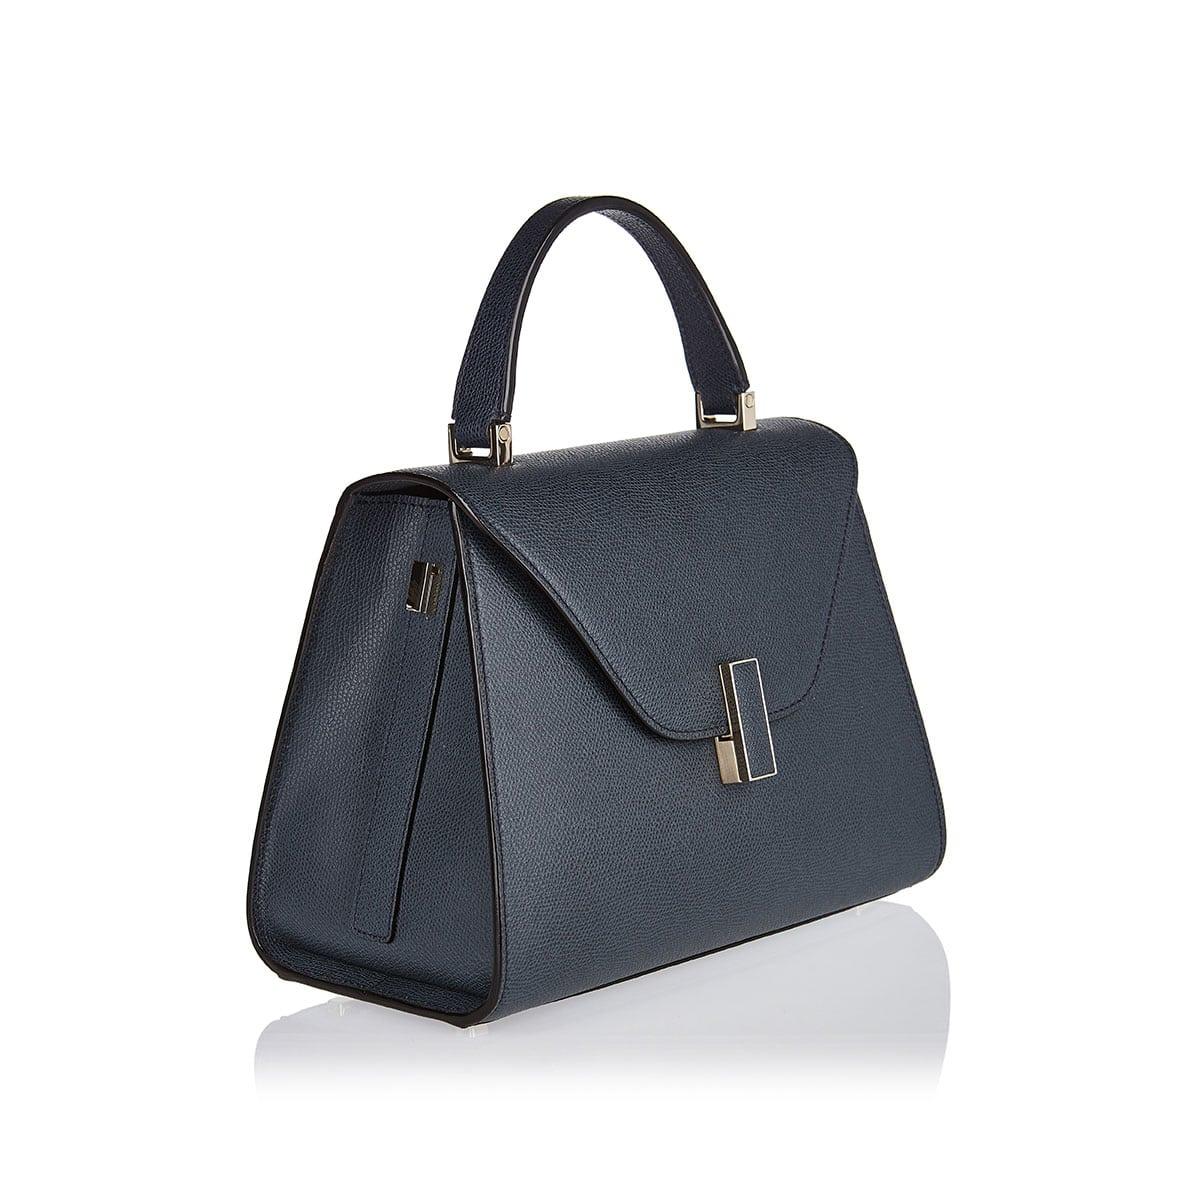 Iside Gioiello medium bag